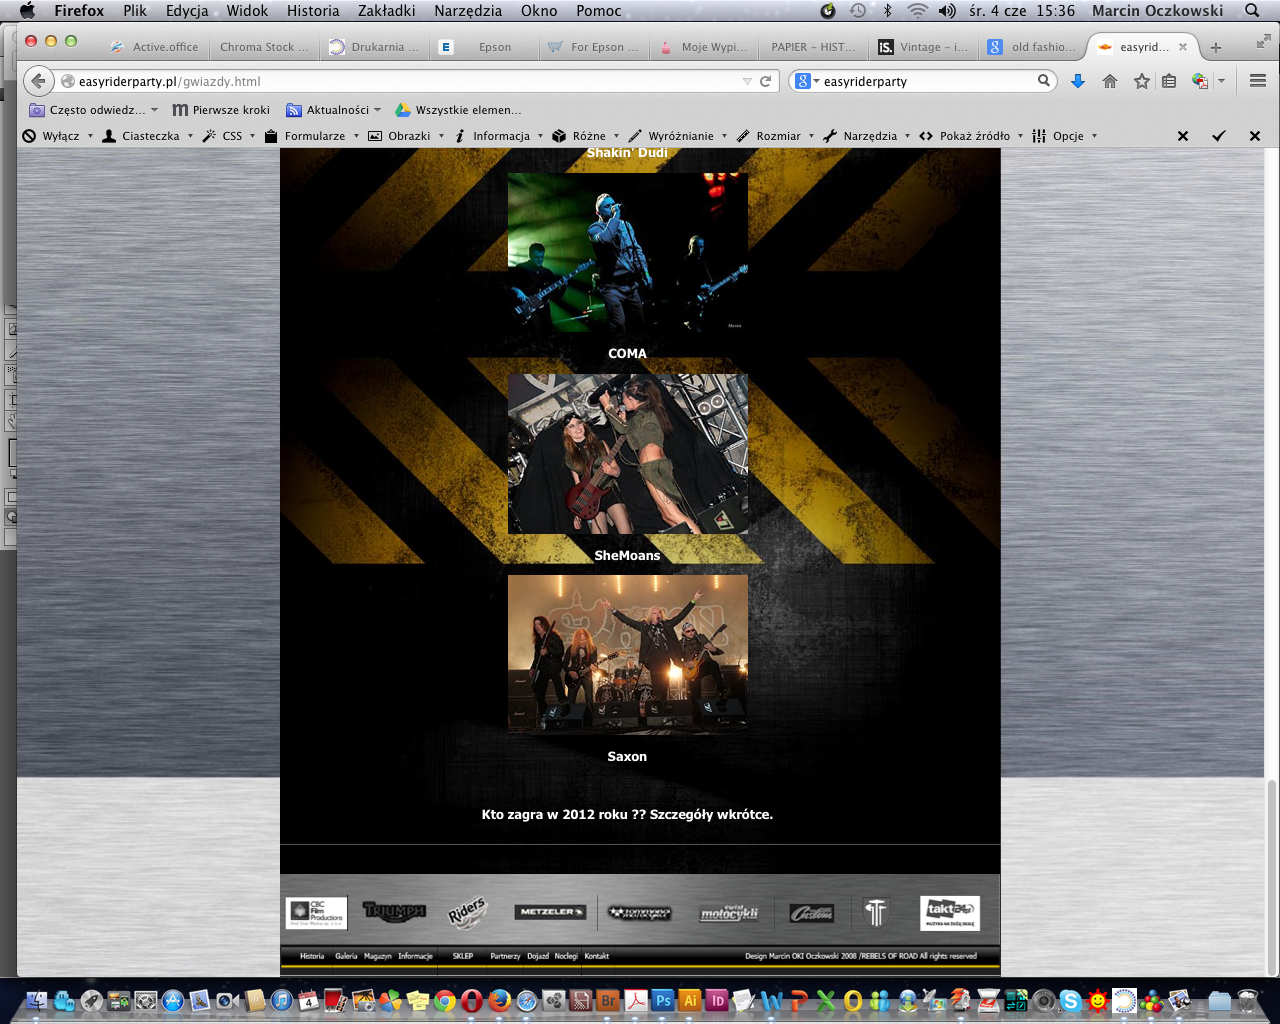 Zrzut ekranu 2014-06-4 o 15.36.47